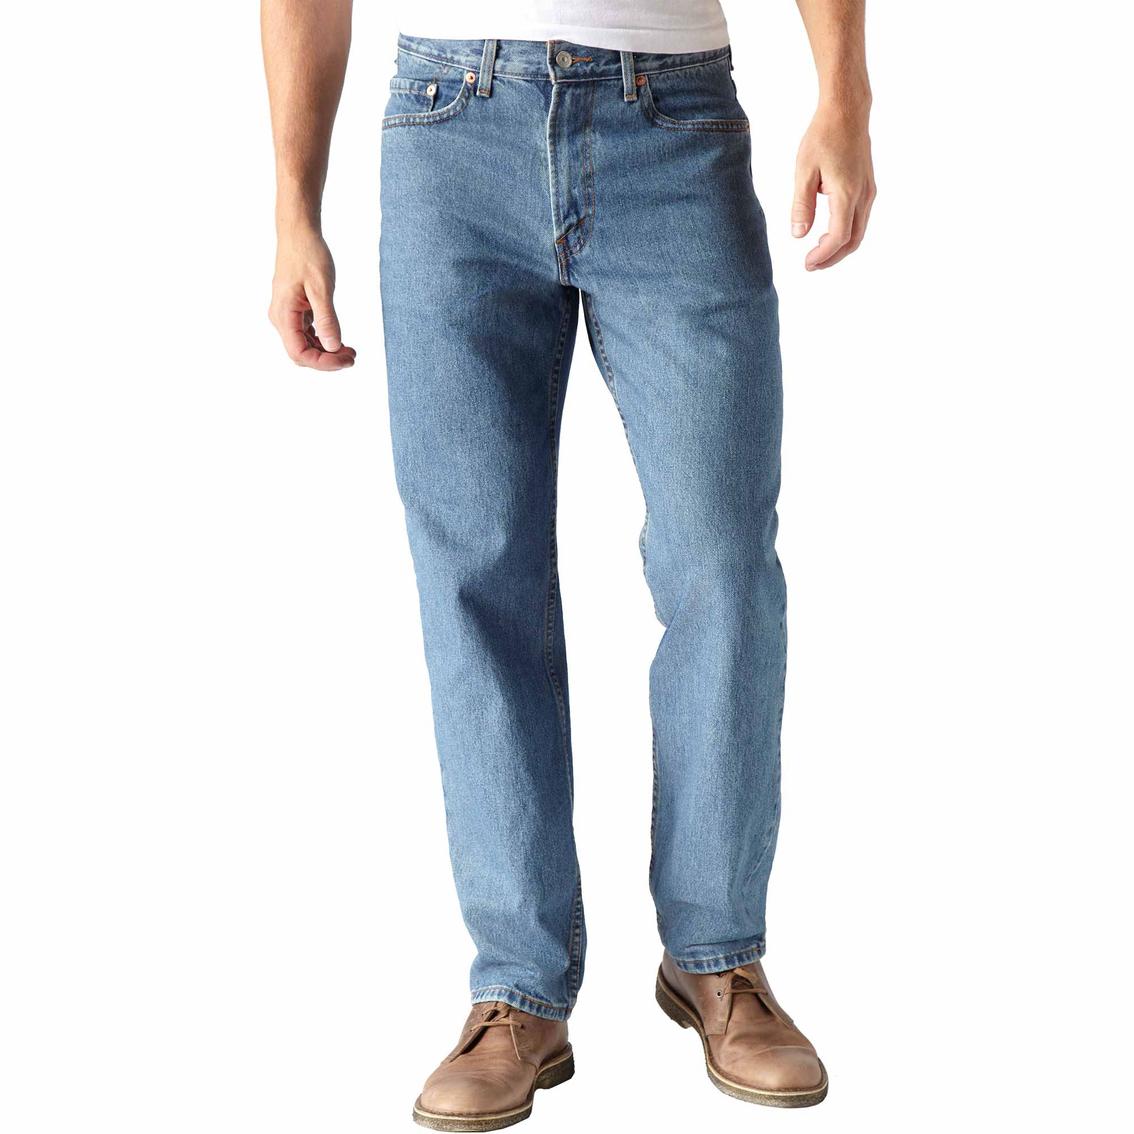 levi 39 s 550 5 pocket relaxed fit jeans jeans apparel. Black Bedroom Furniture Sets. Home Design Ideas